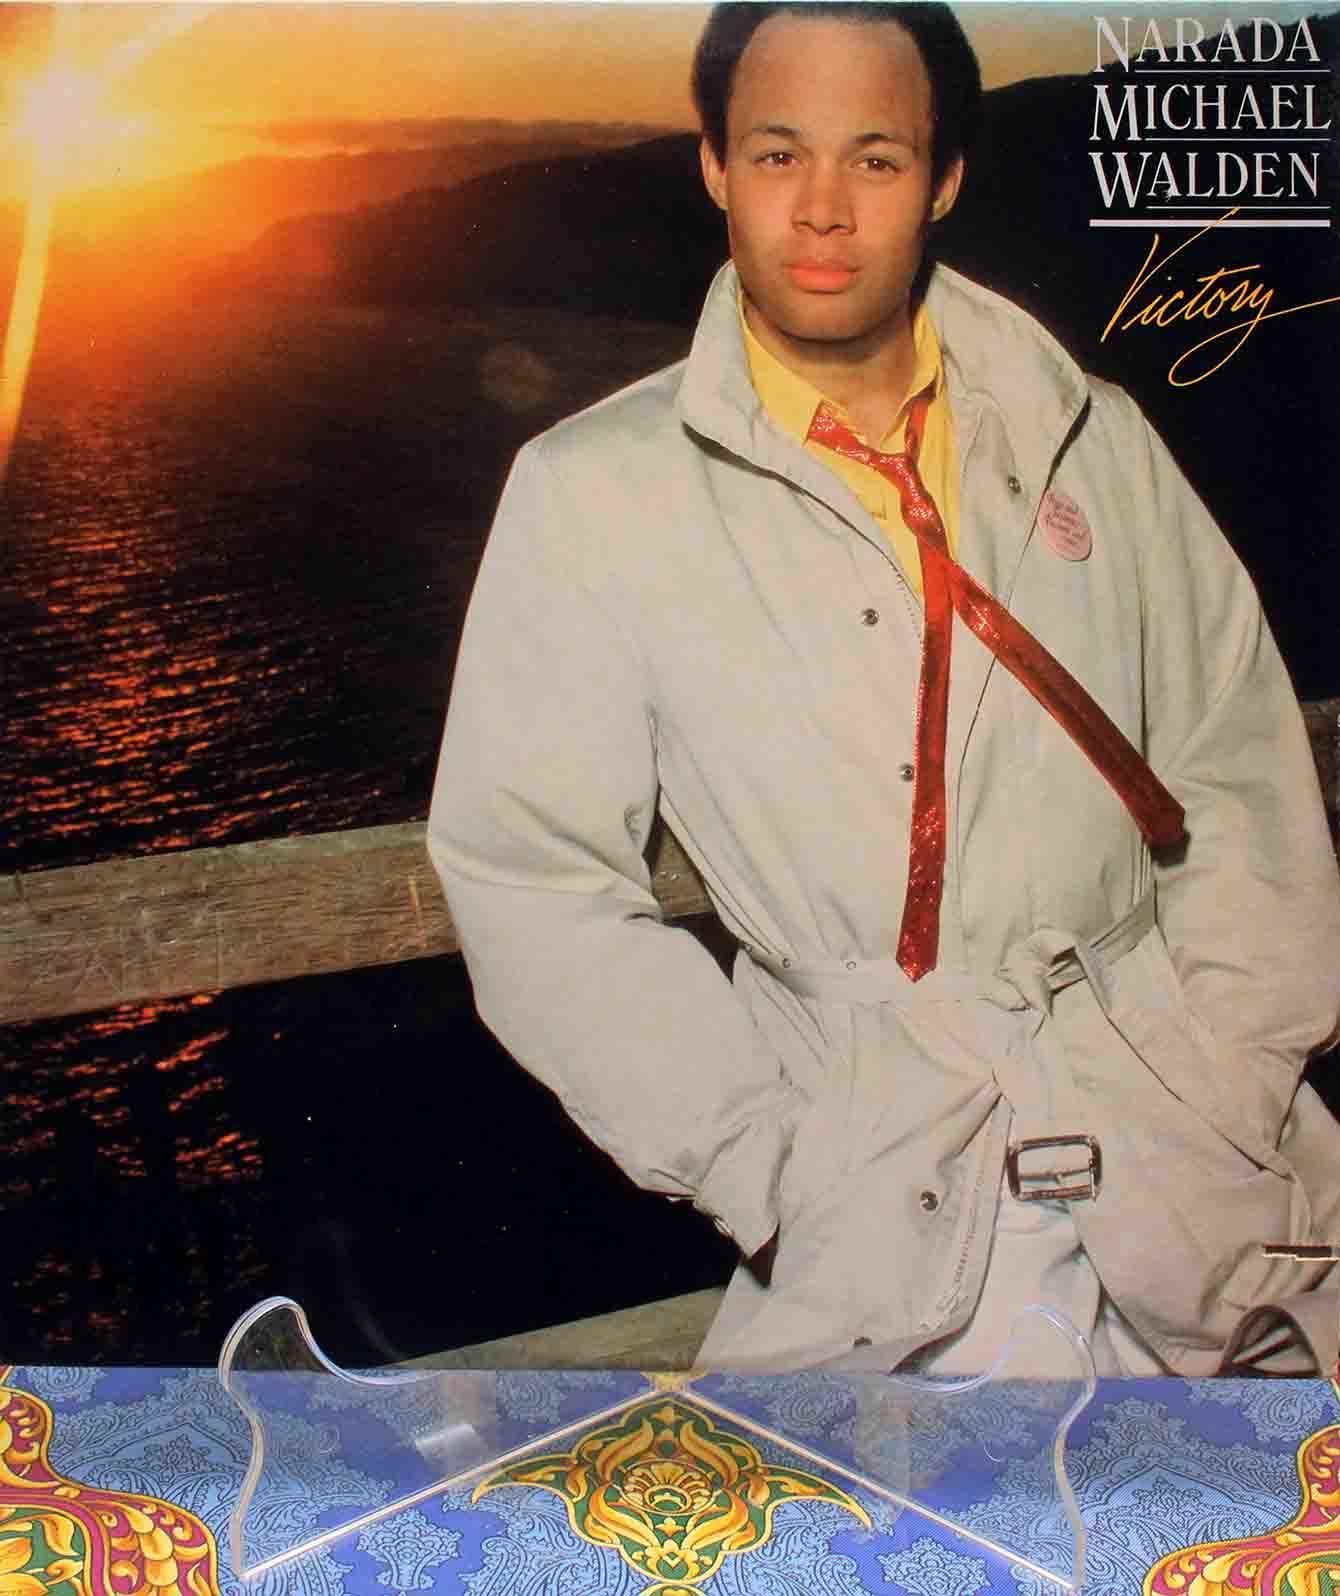 Narada Michael Walden Victory 01